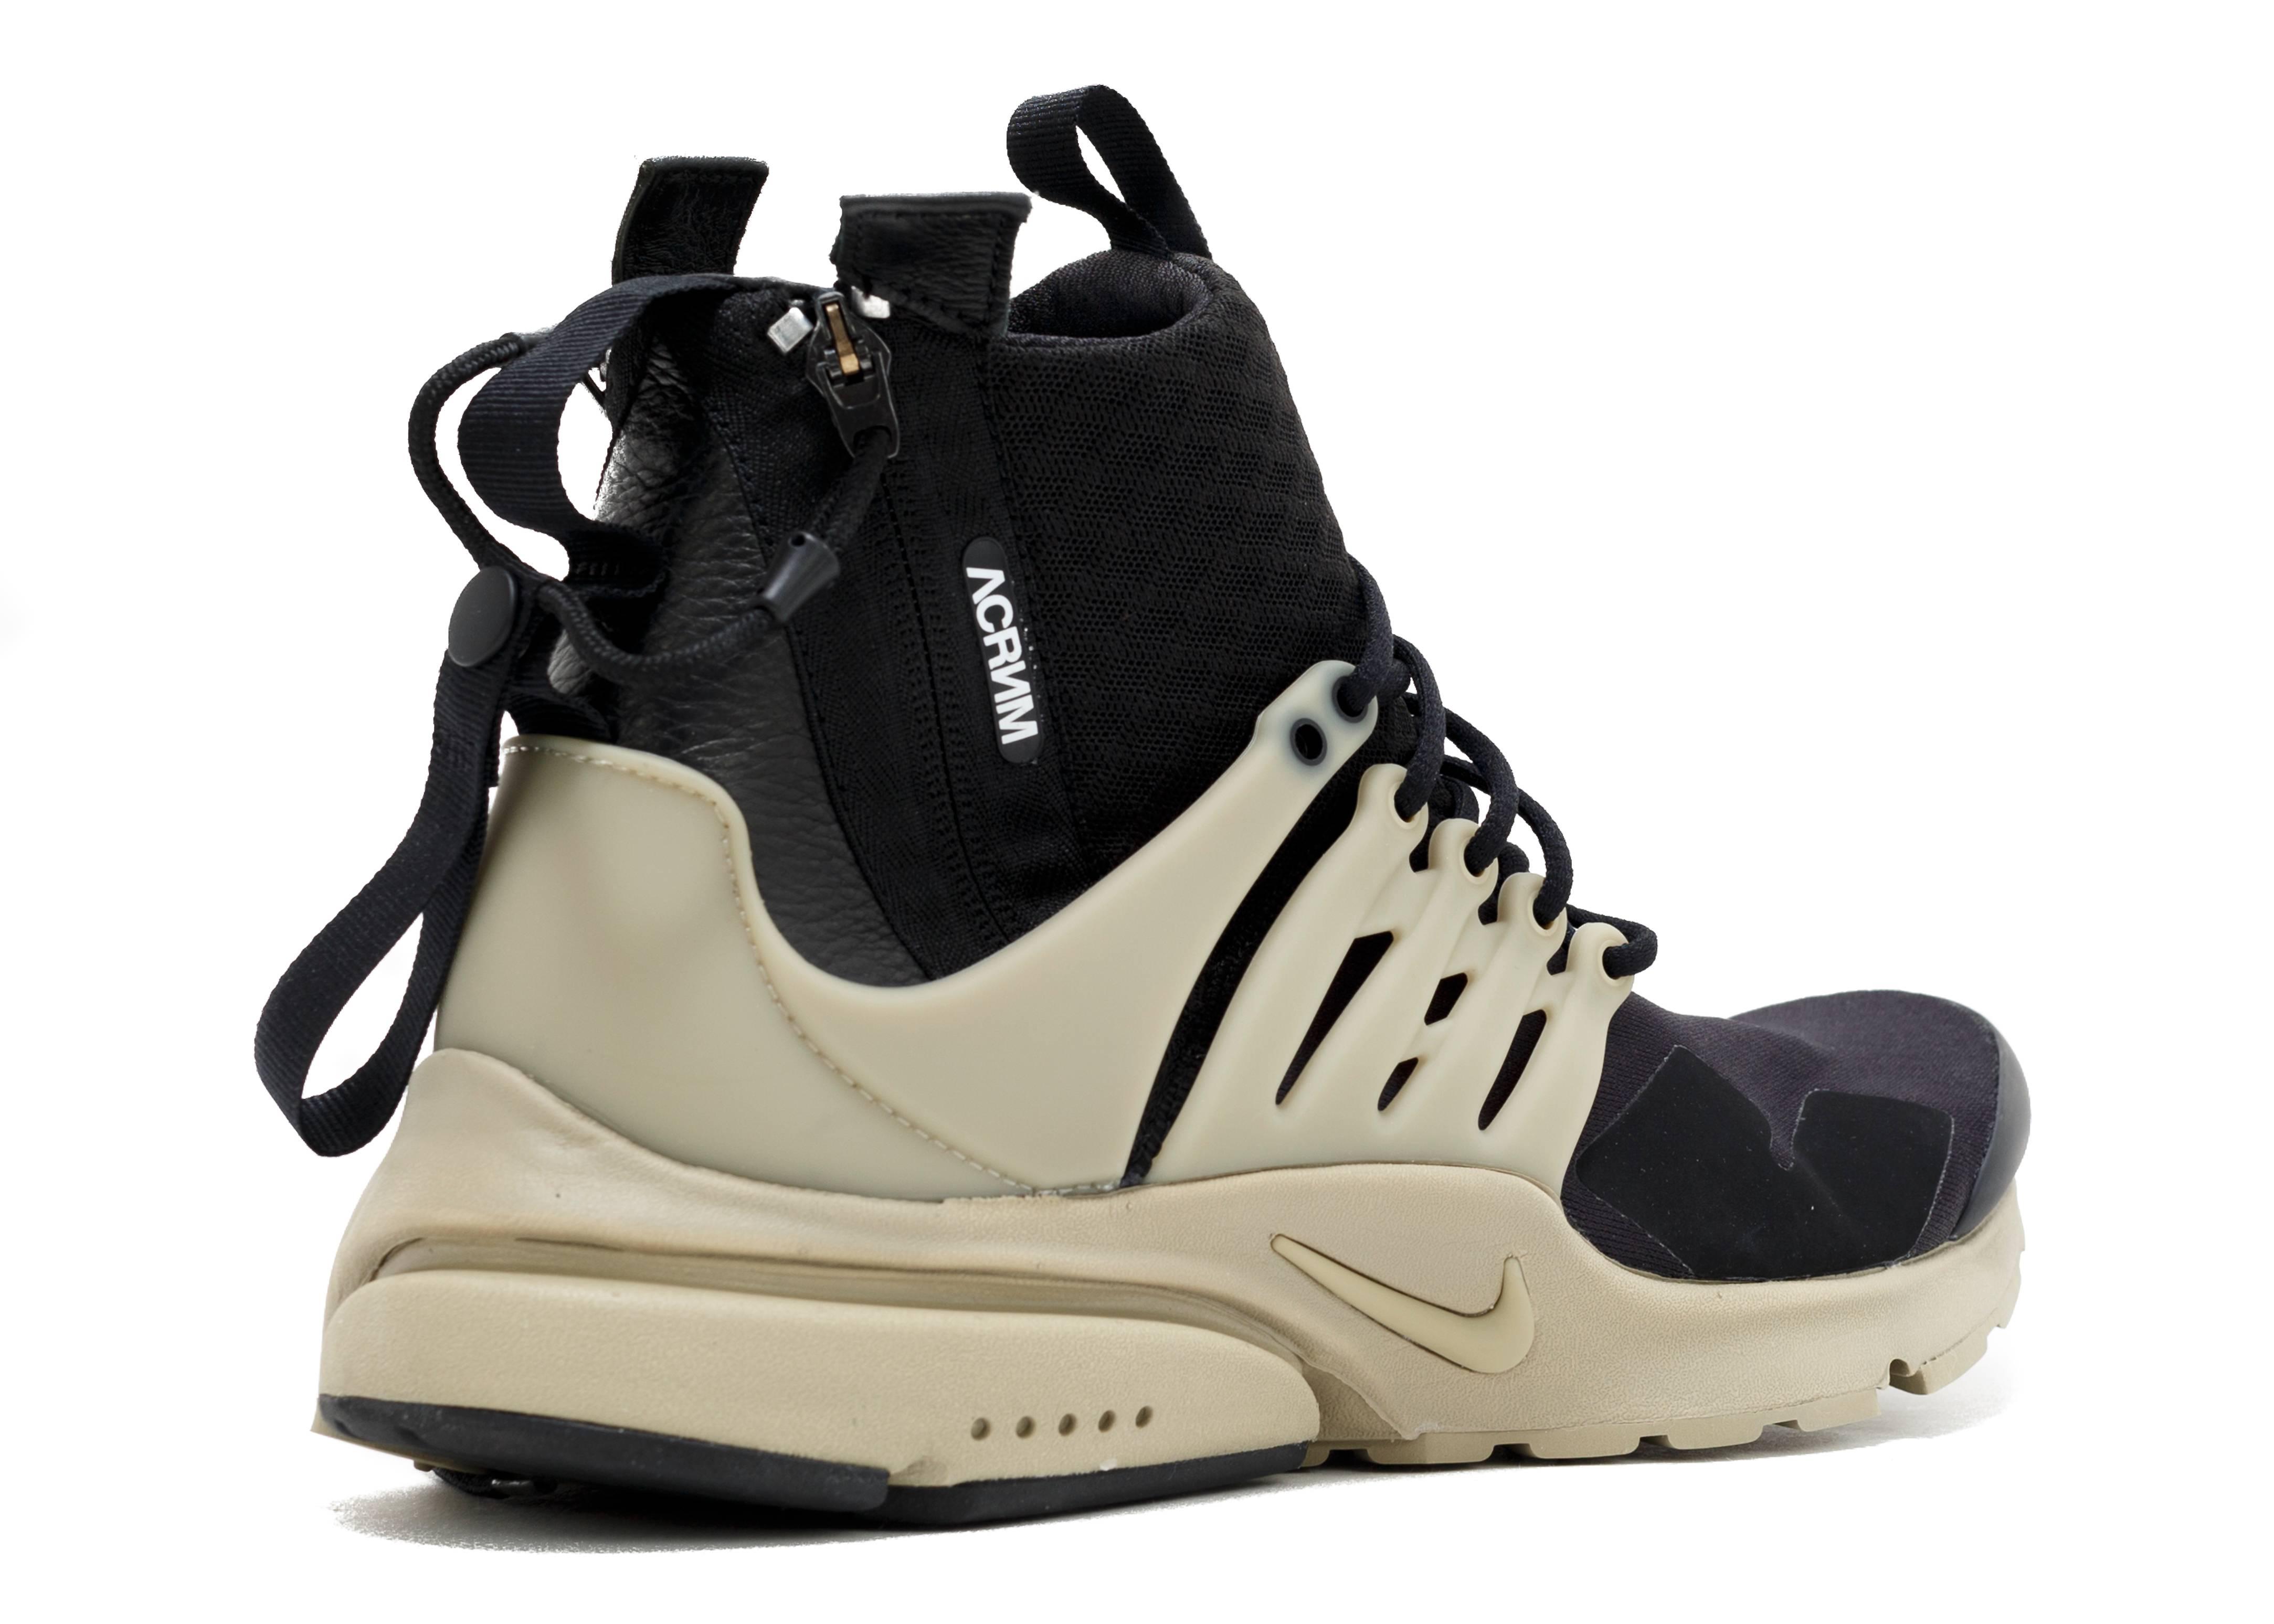 nike air presto acronym flight club Chaussures online